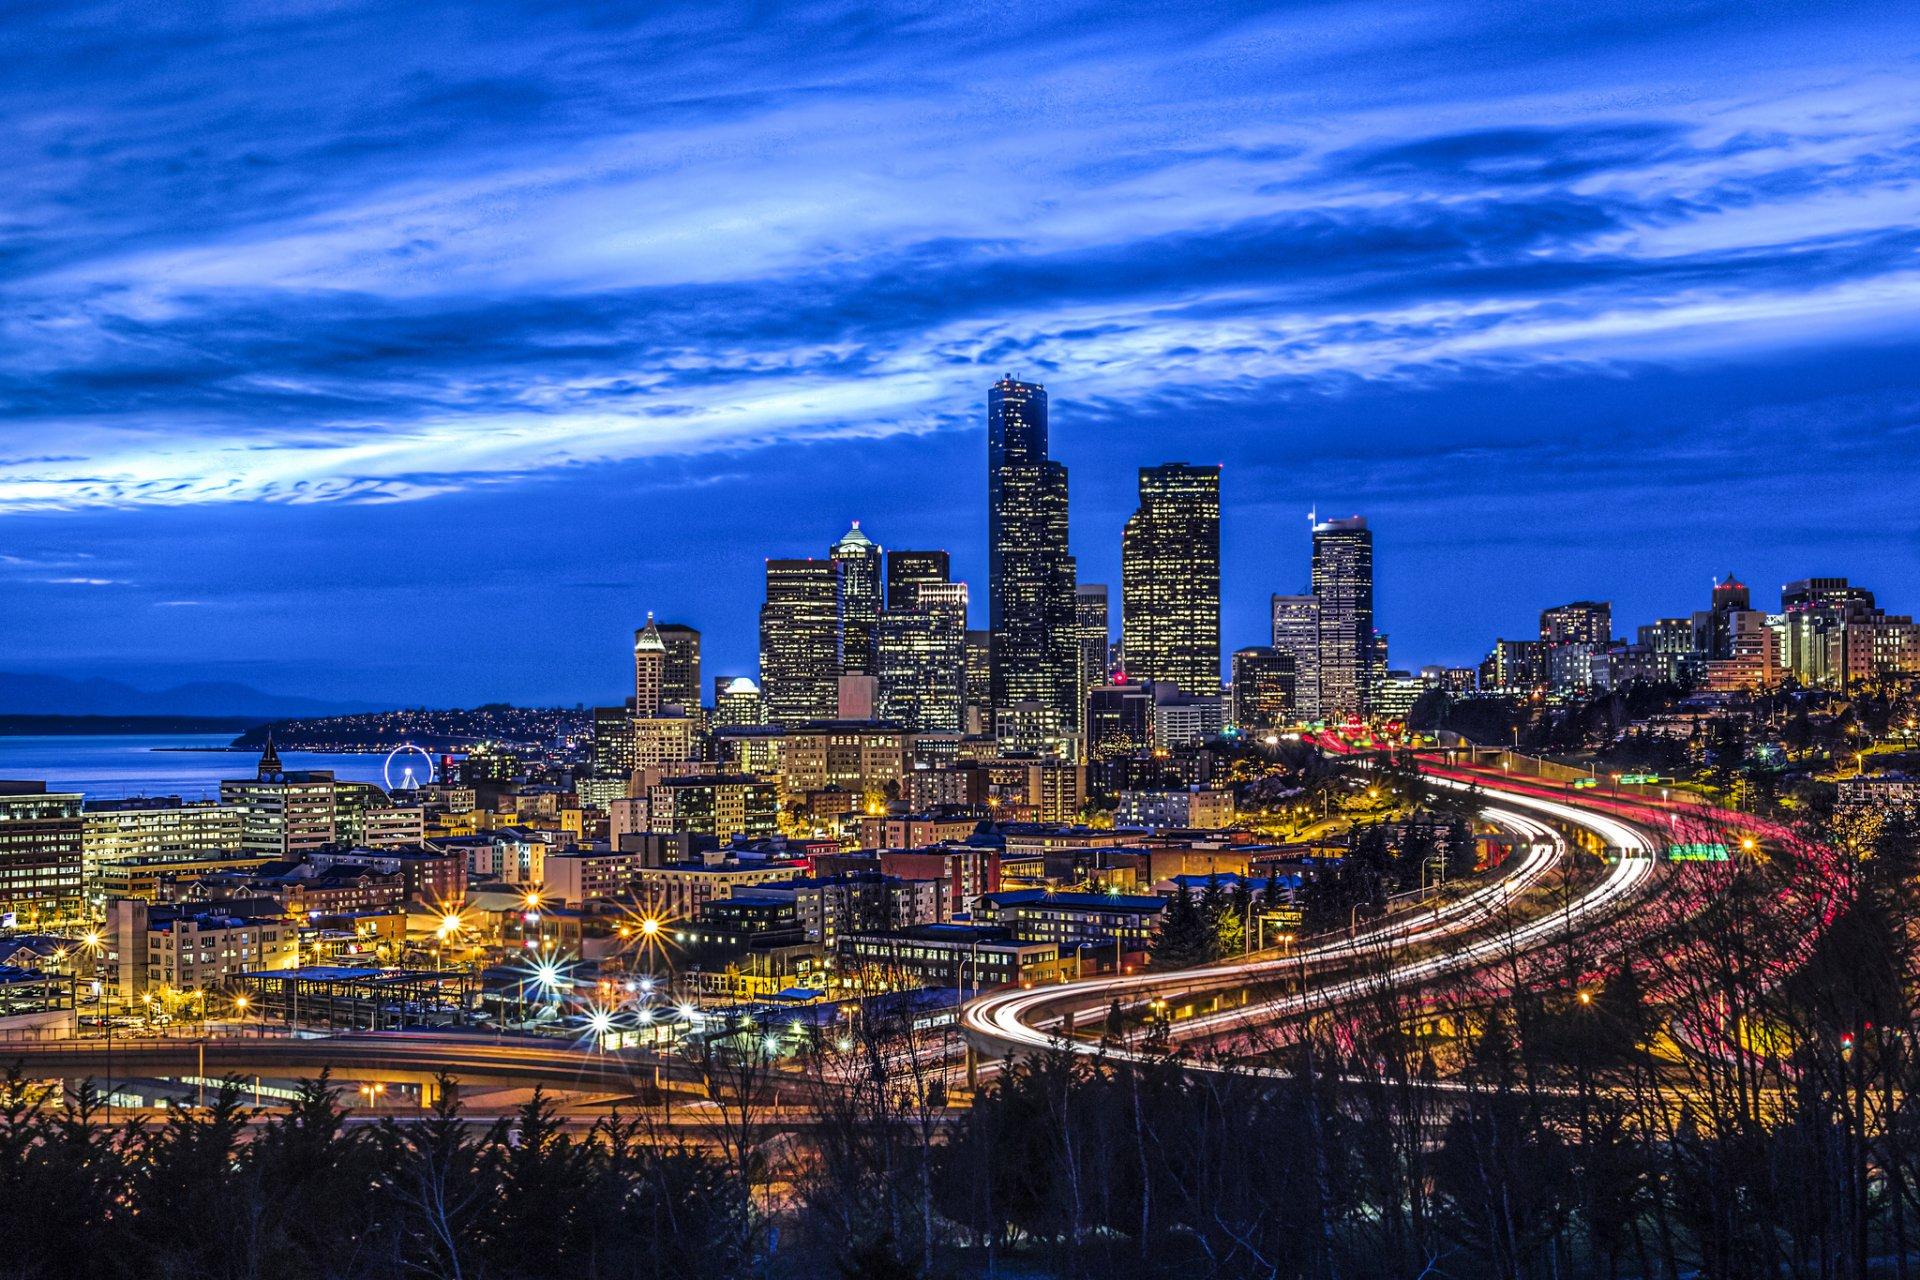 Seattle Washington Fall Skyline Wallpaper Seattle Cityscape At Dusk Hd Wallpaper Background Image